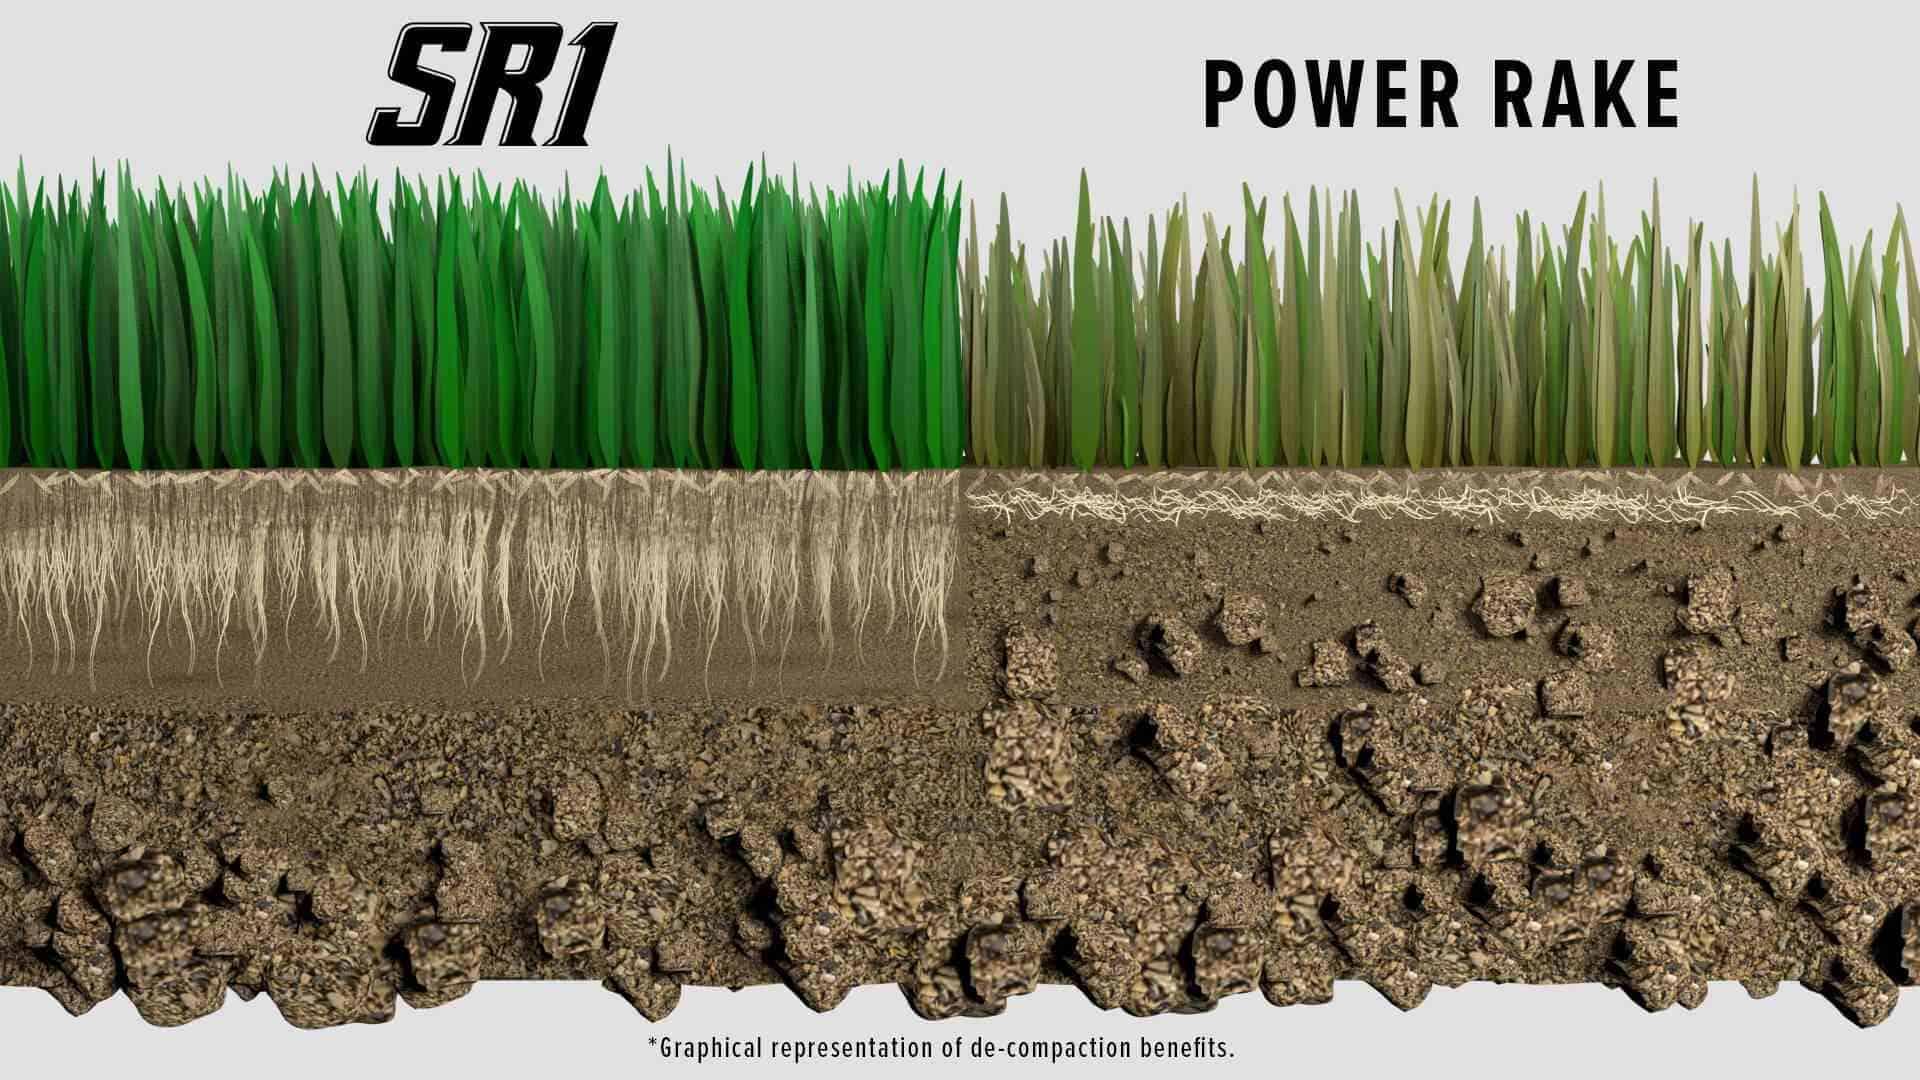 SR1 Decompacted Soil